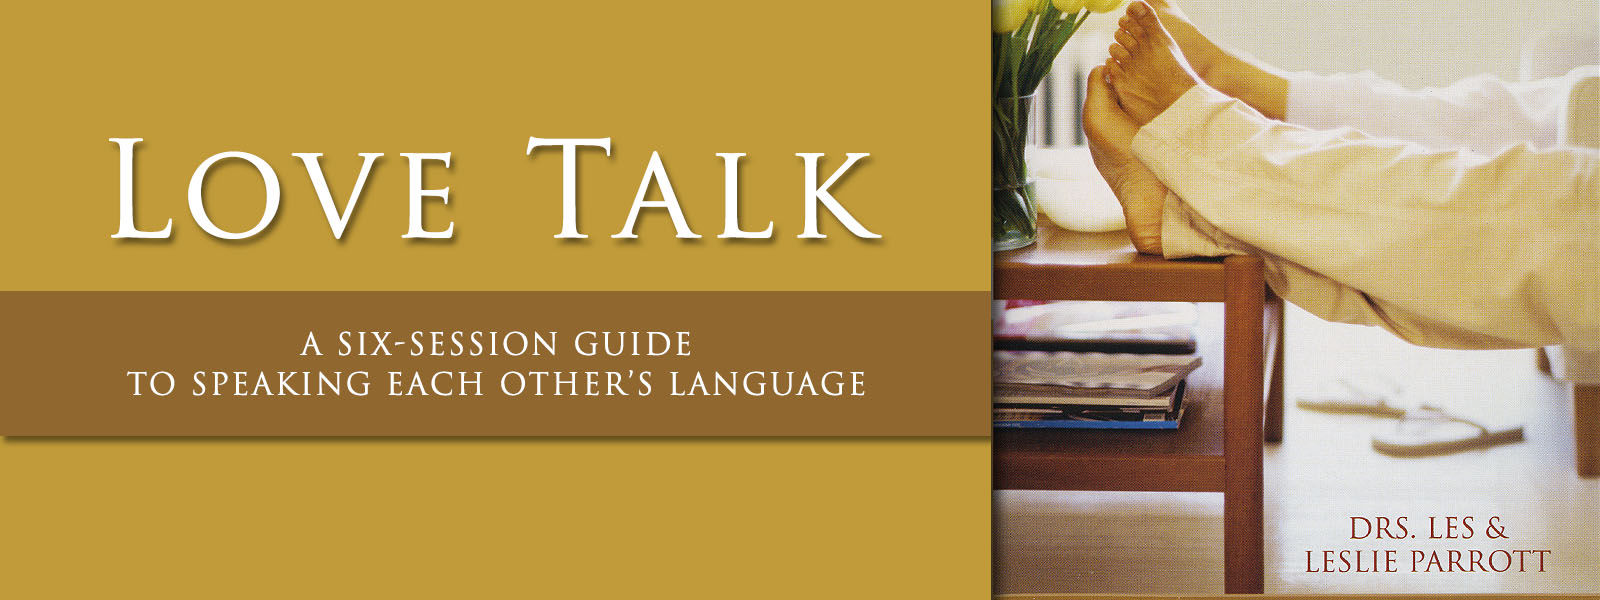 Rightnow Media Streaming Bible Study Love Talk 2004 Les Leslie Parrott Center For Real Relationships